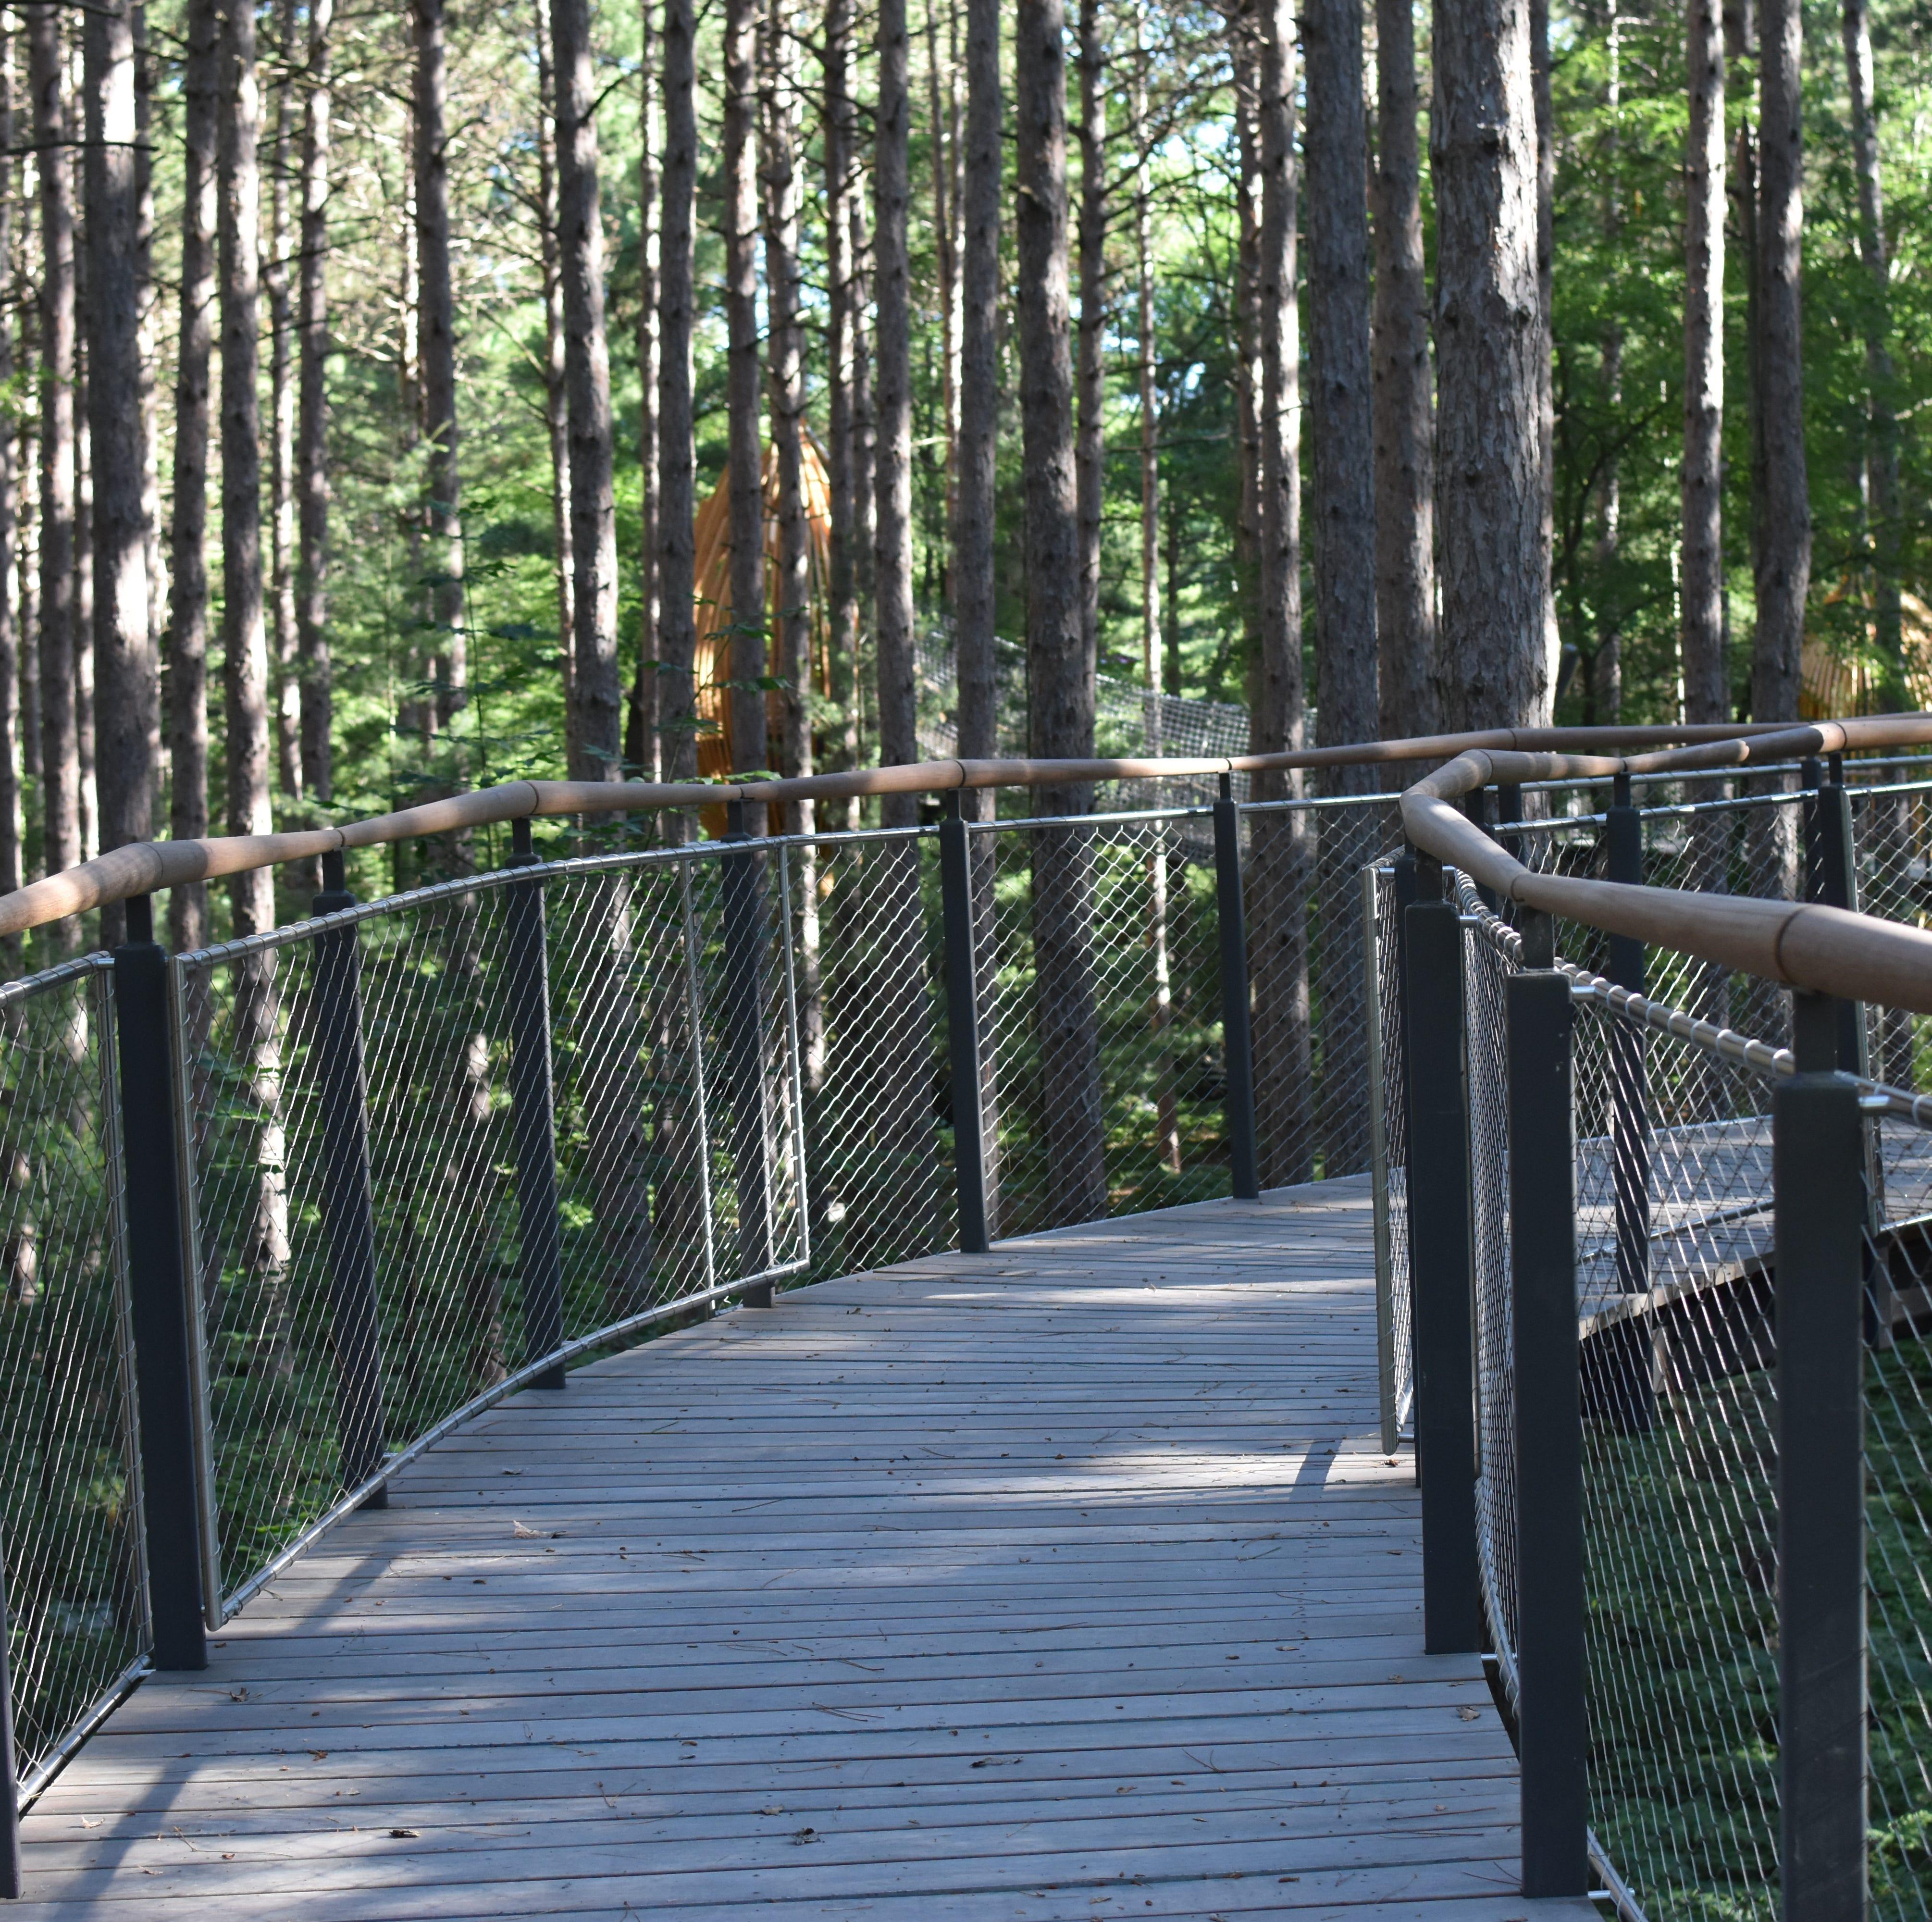 America's longest canopy walk opens in Michigan this weekend